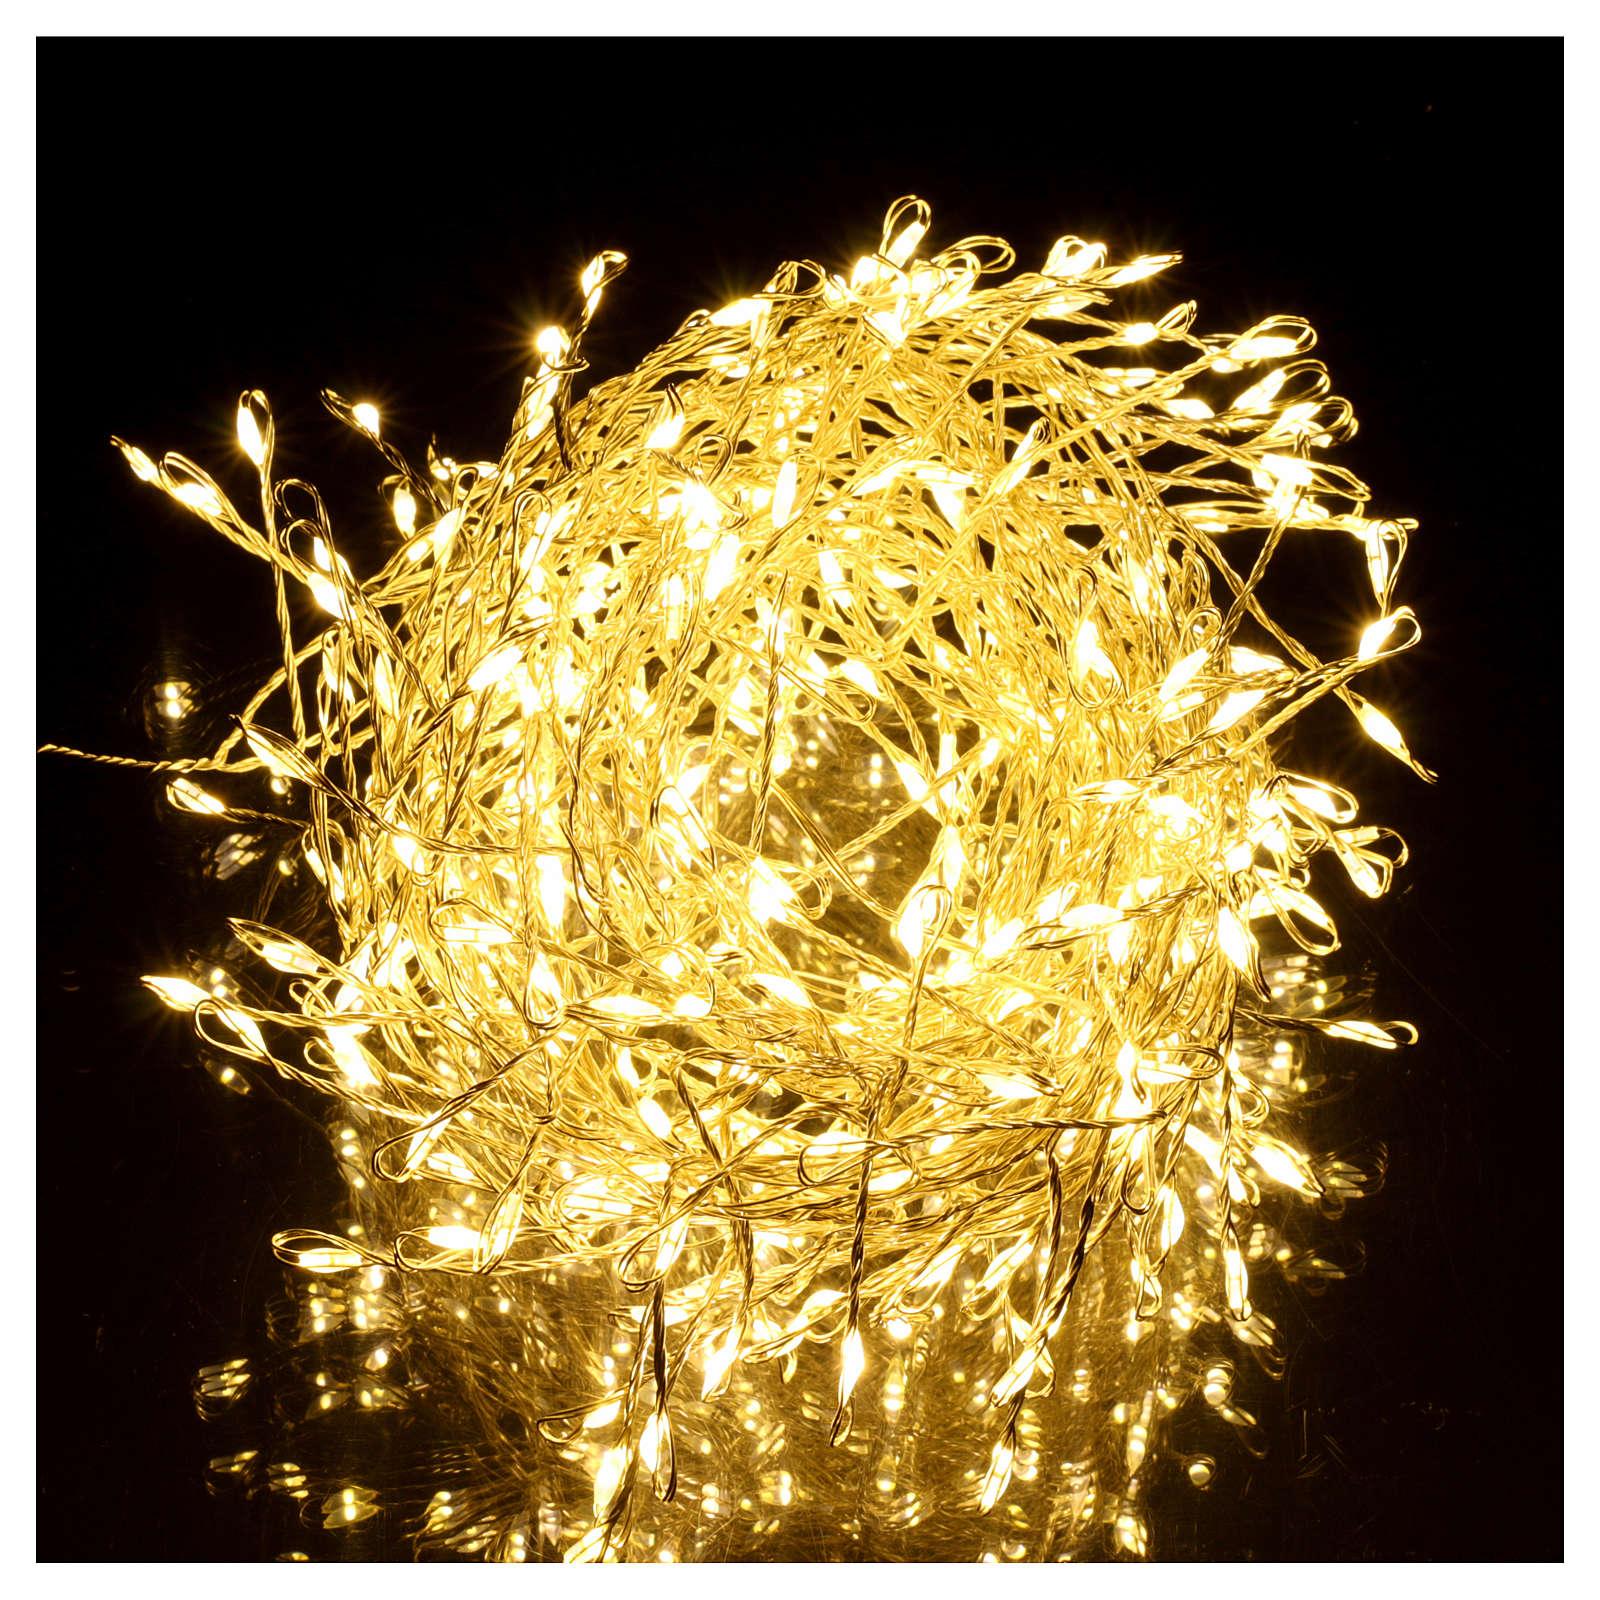 Ghirlanda luminosa 300 micro LED bianco caldo INTERNO corrente 3